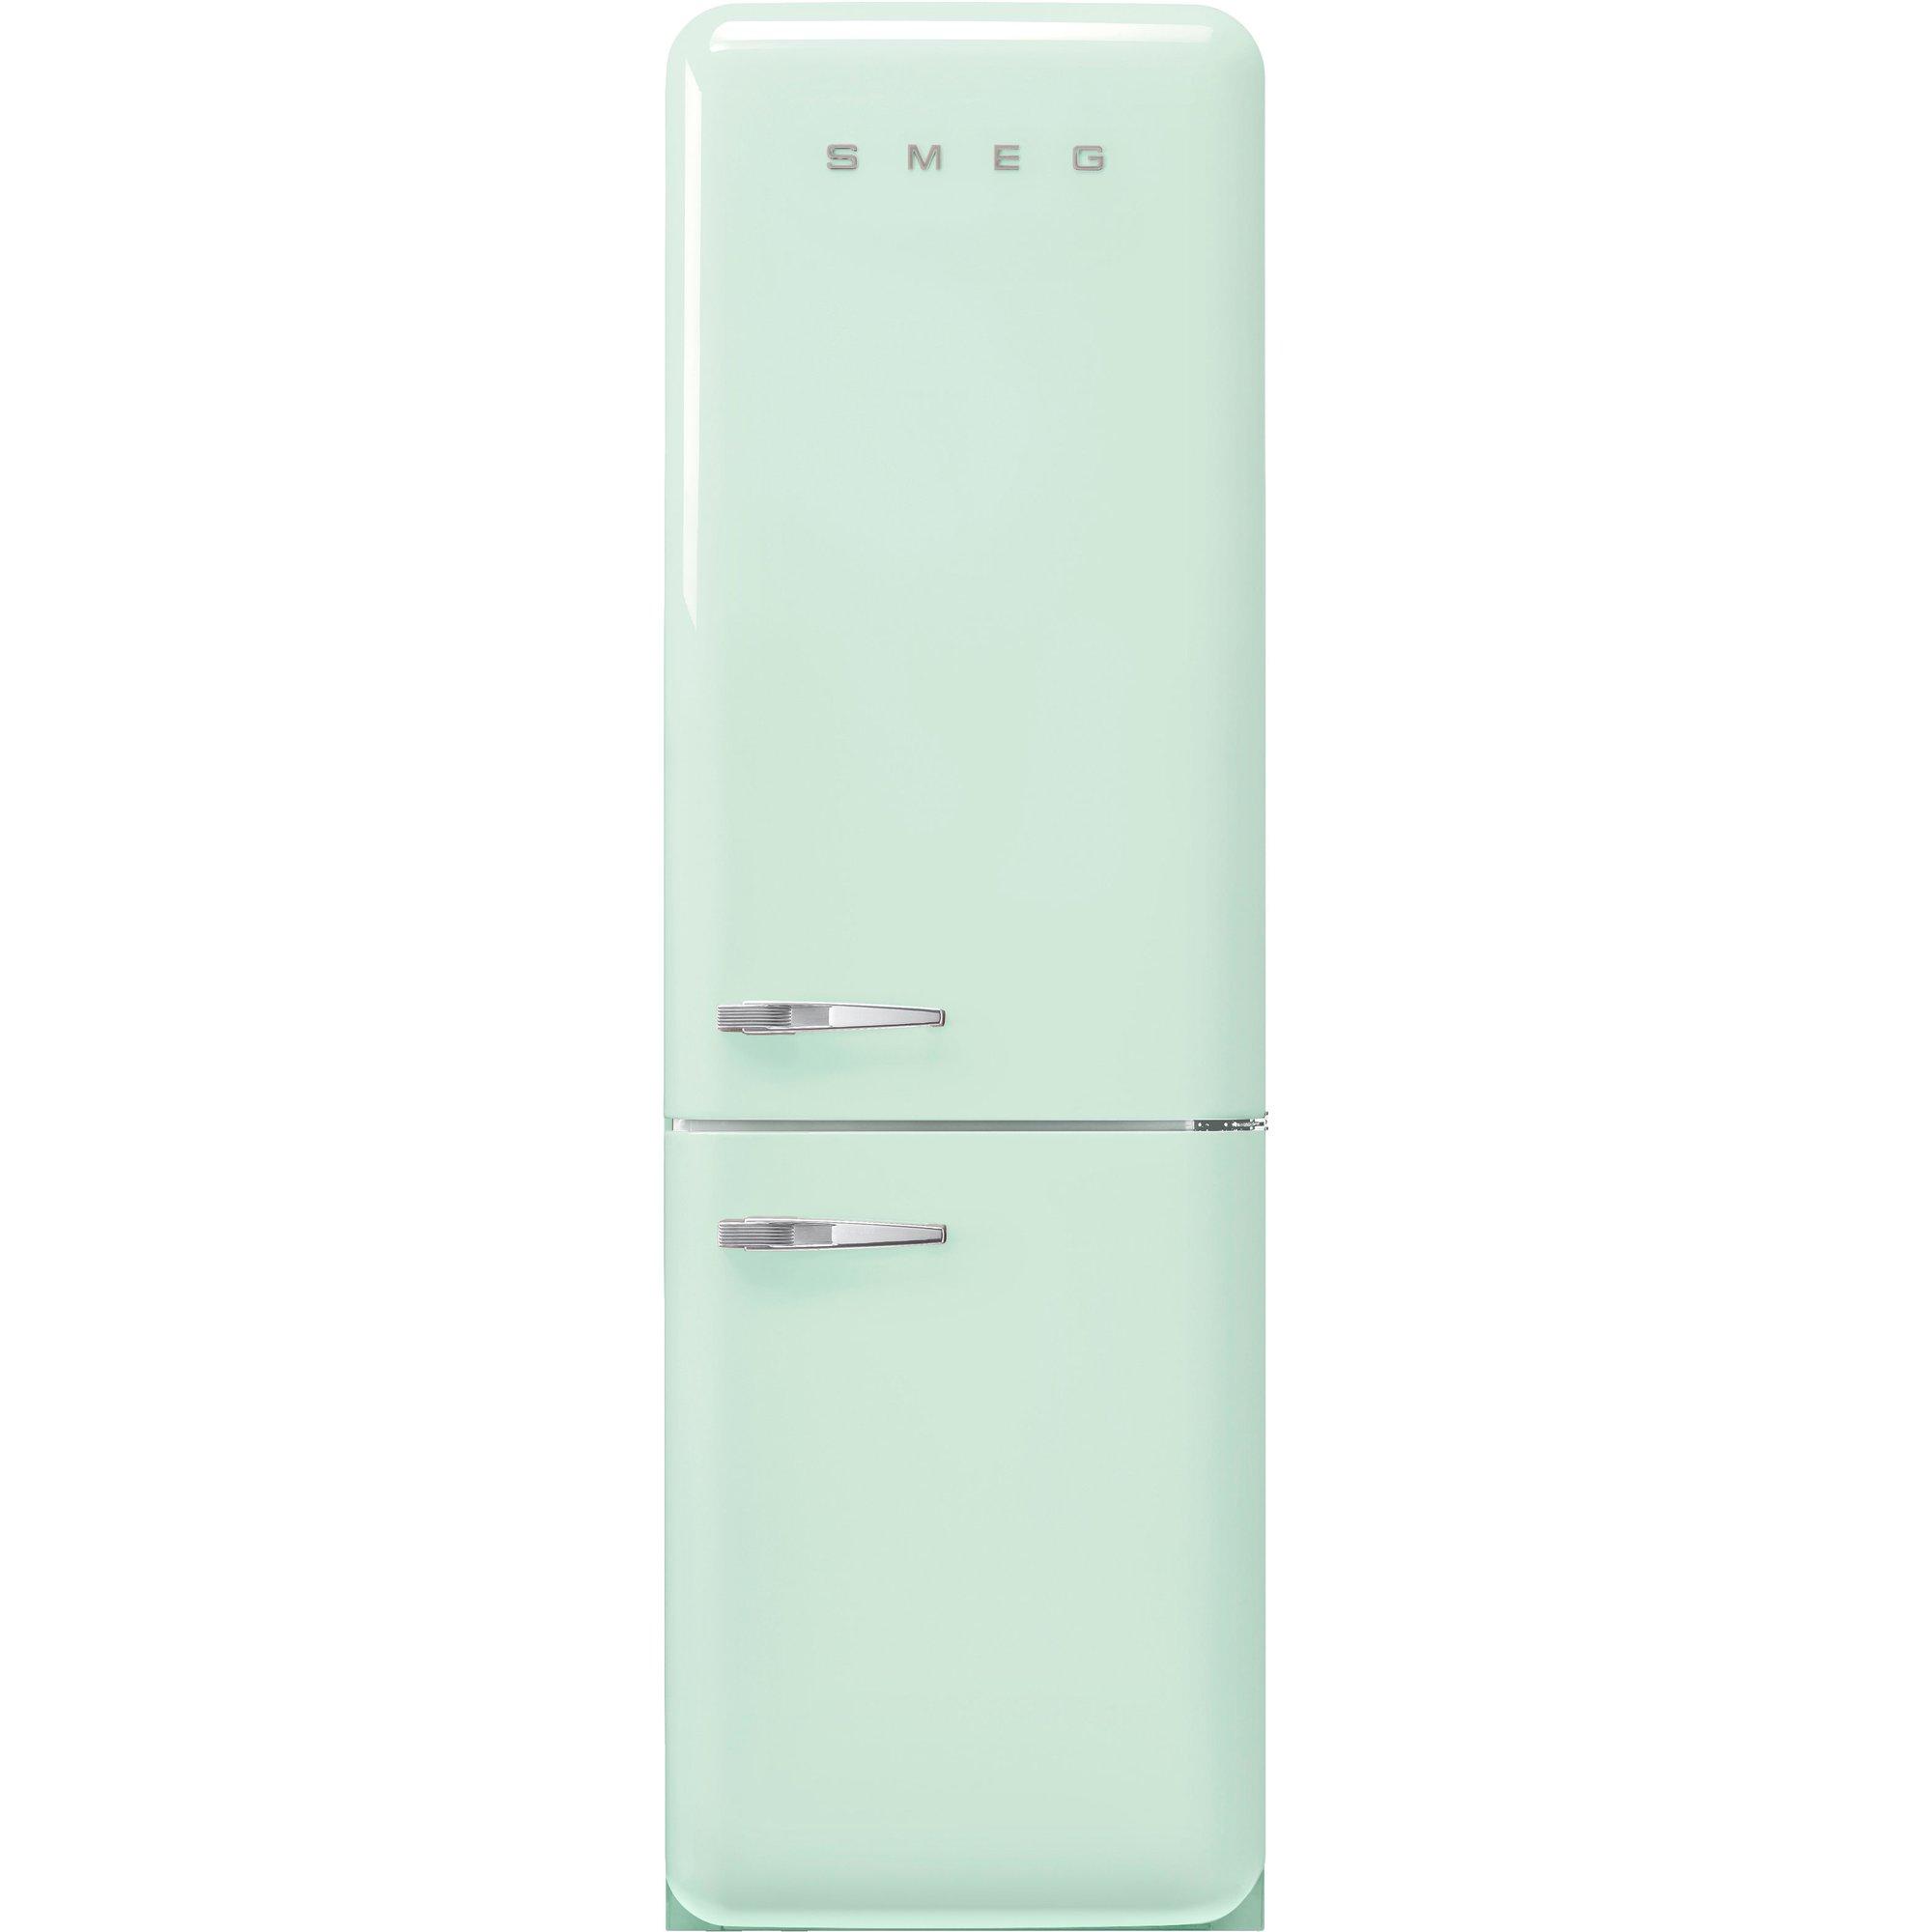 Smeg FAB32RPG5 Køle-/fryseskab pastelgrøn